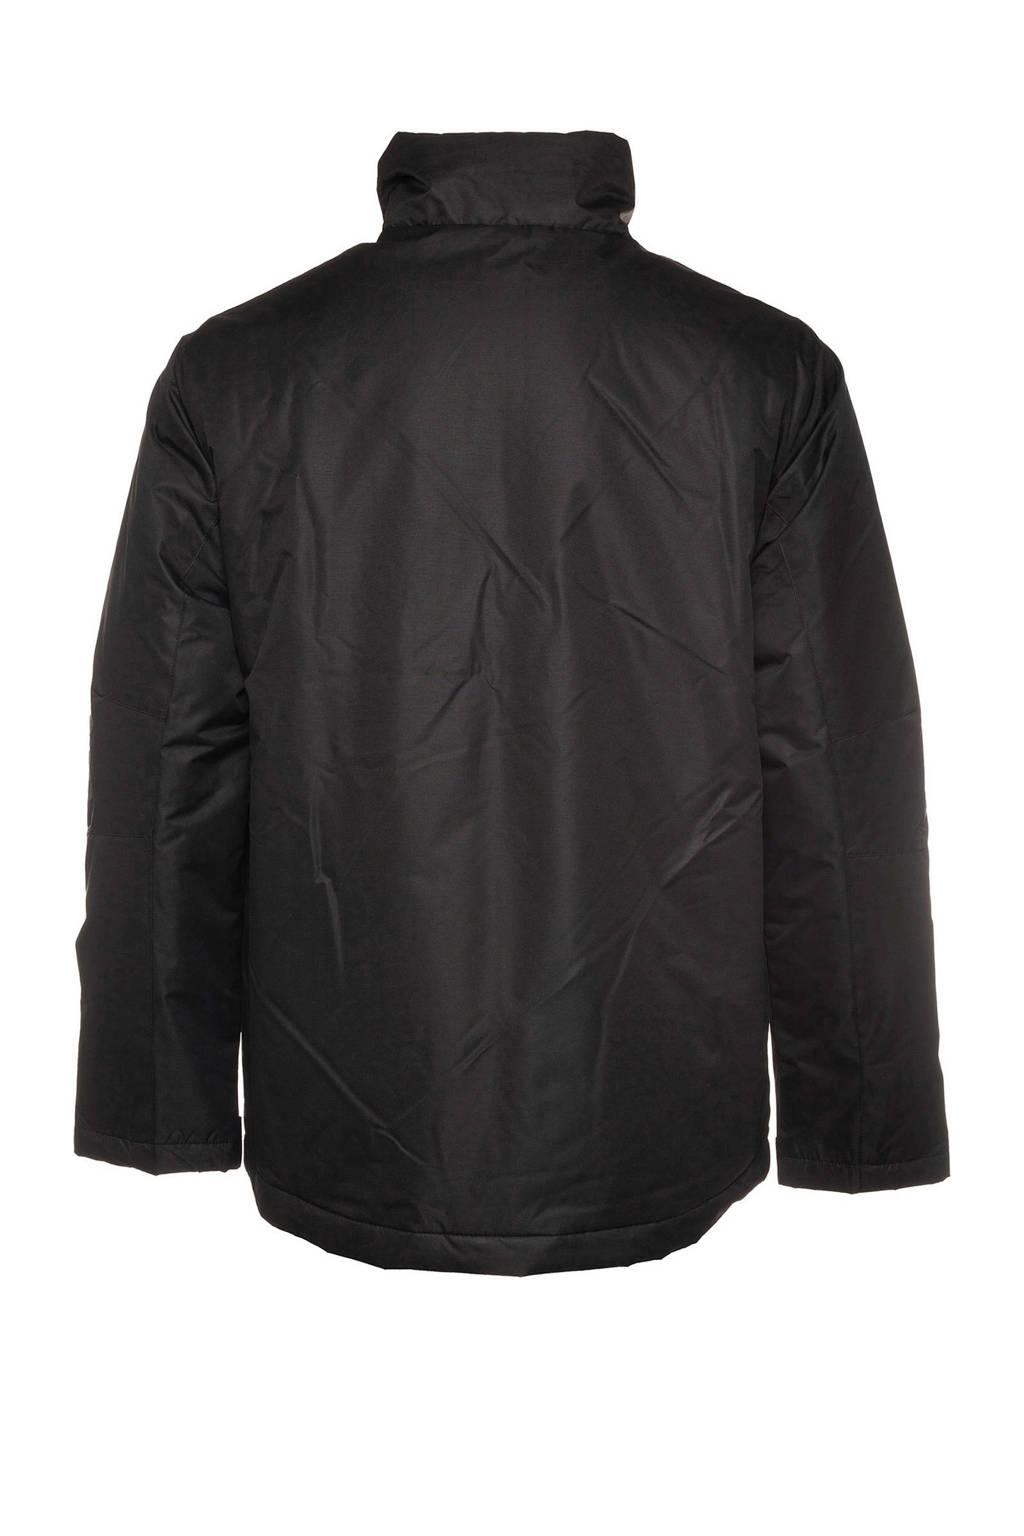 Mountain Peak outdoor jas zwart, Zwart